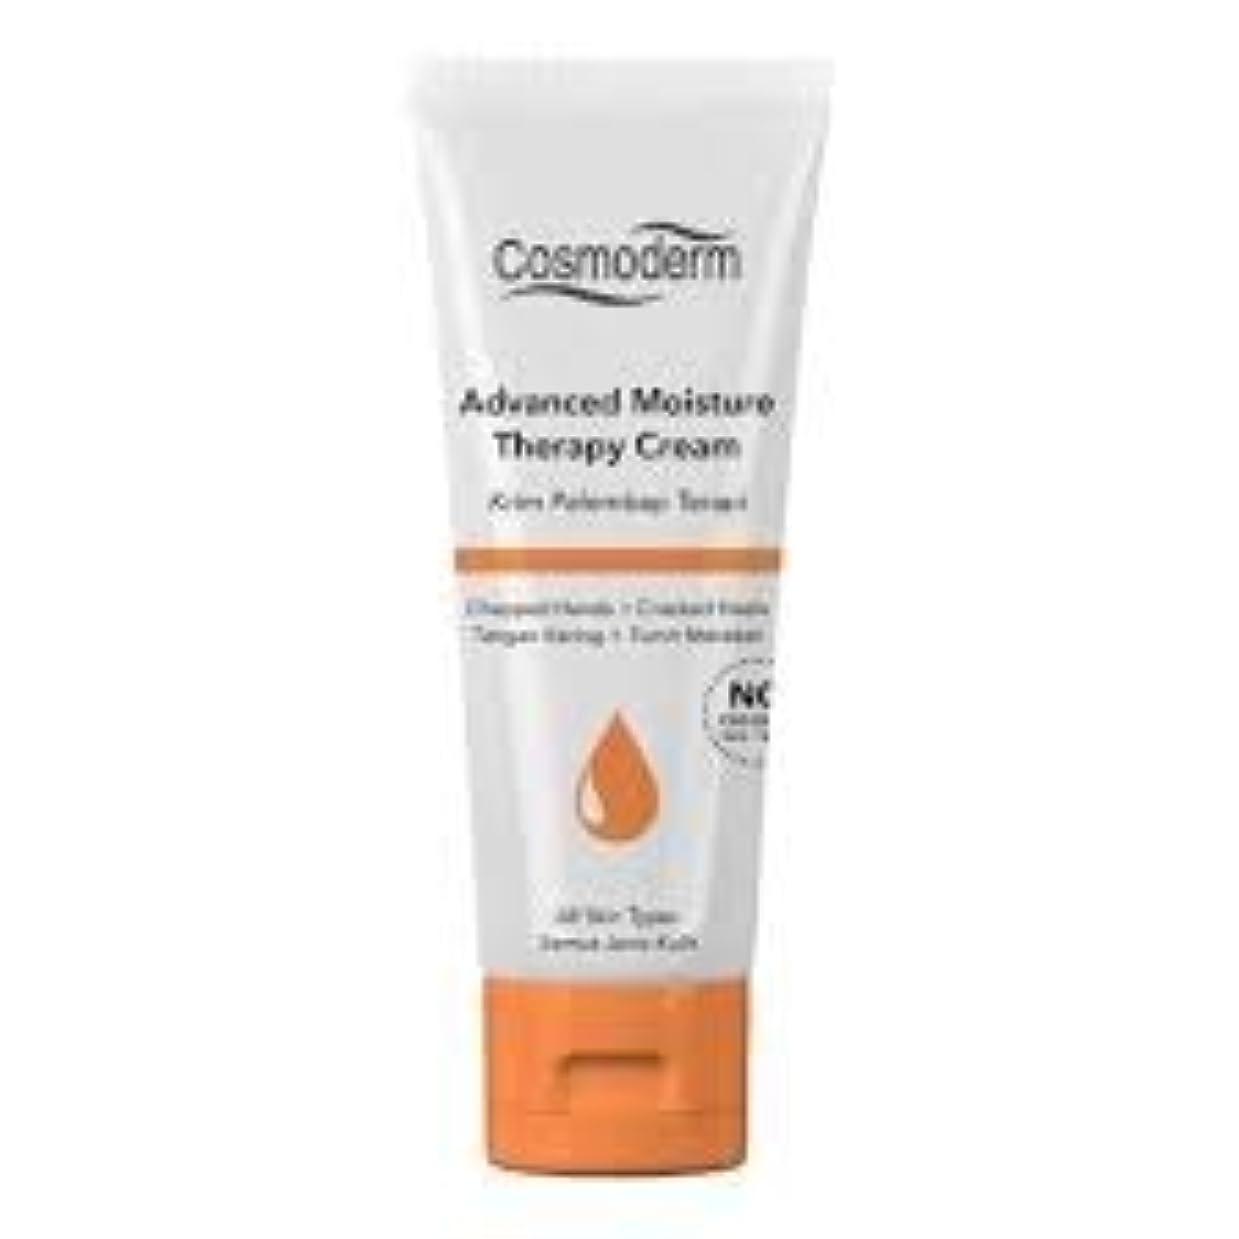 COSMODERM 高度な水処理の関節クリーム60ミリリットル - ハード、肌荒れに潤いと和らげます